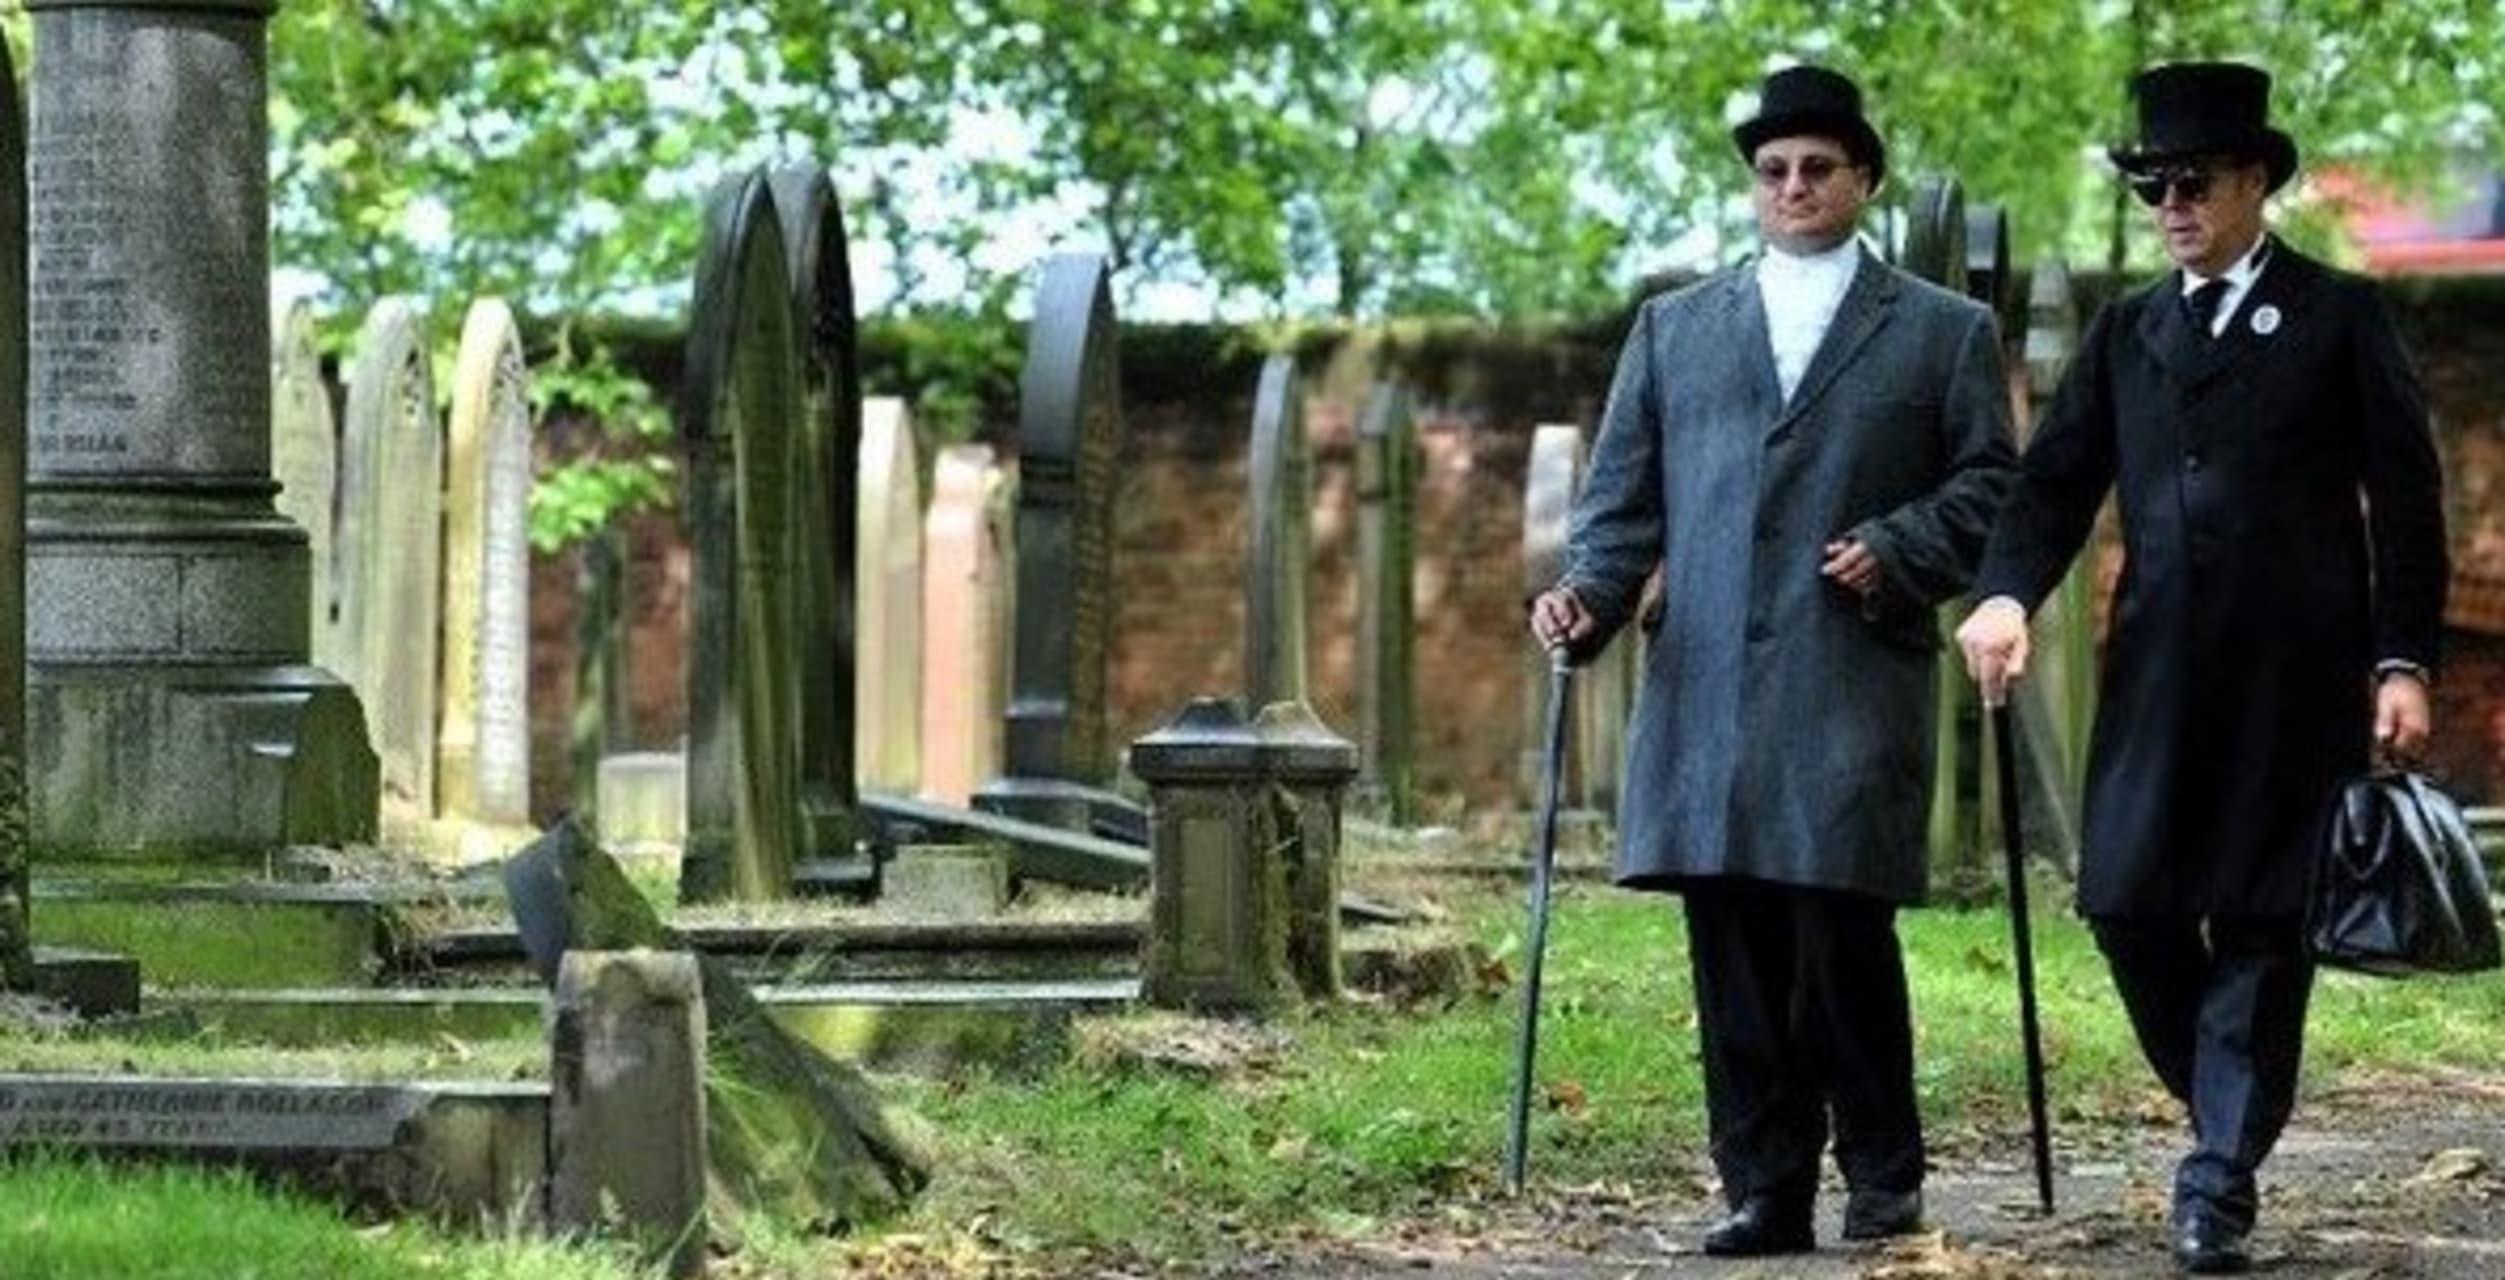 Birmingham - Death, Burial and Mourning in Victorian Birmingham